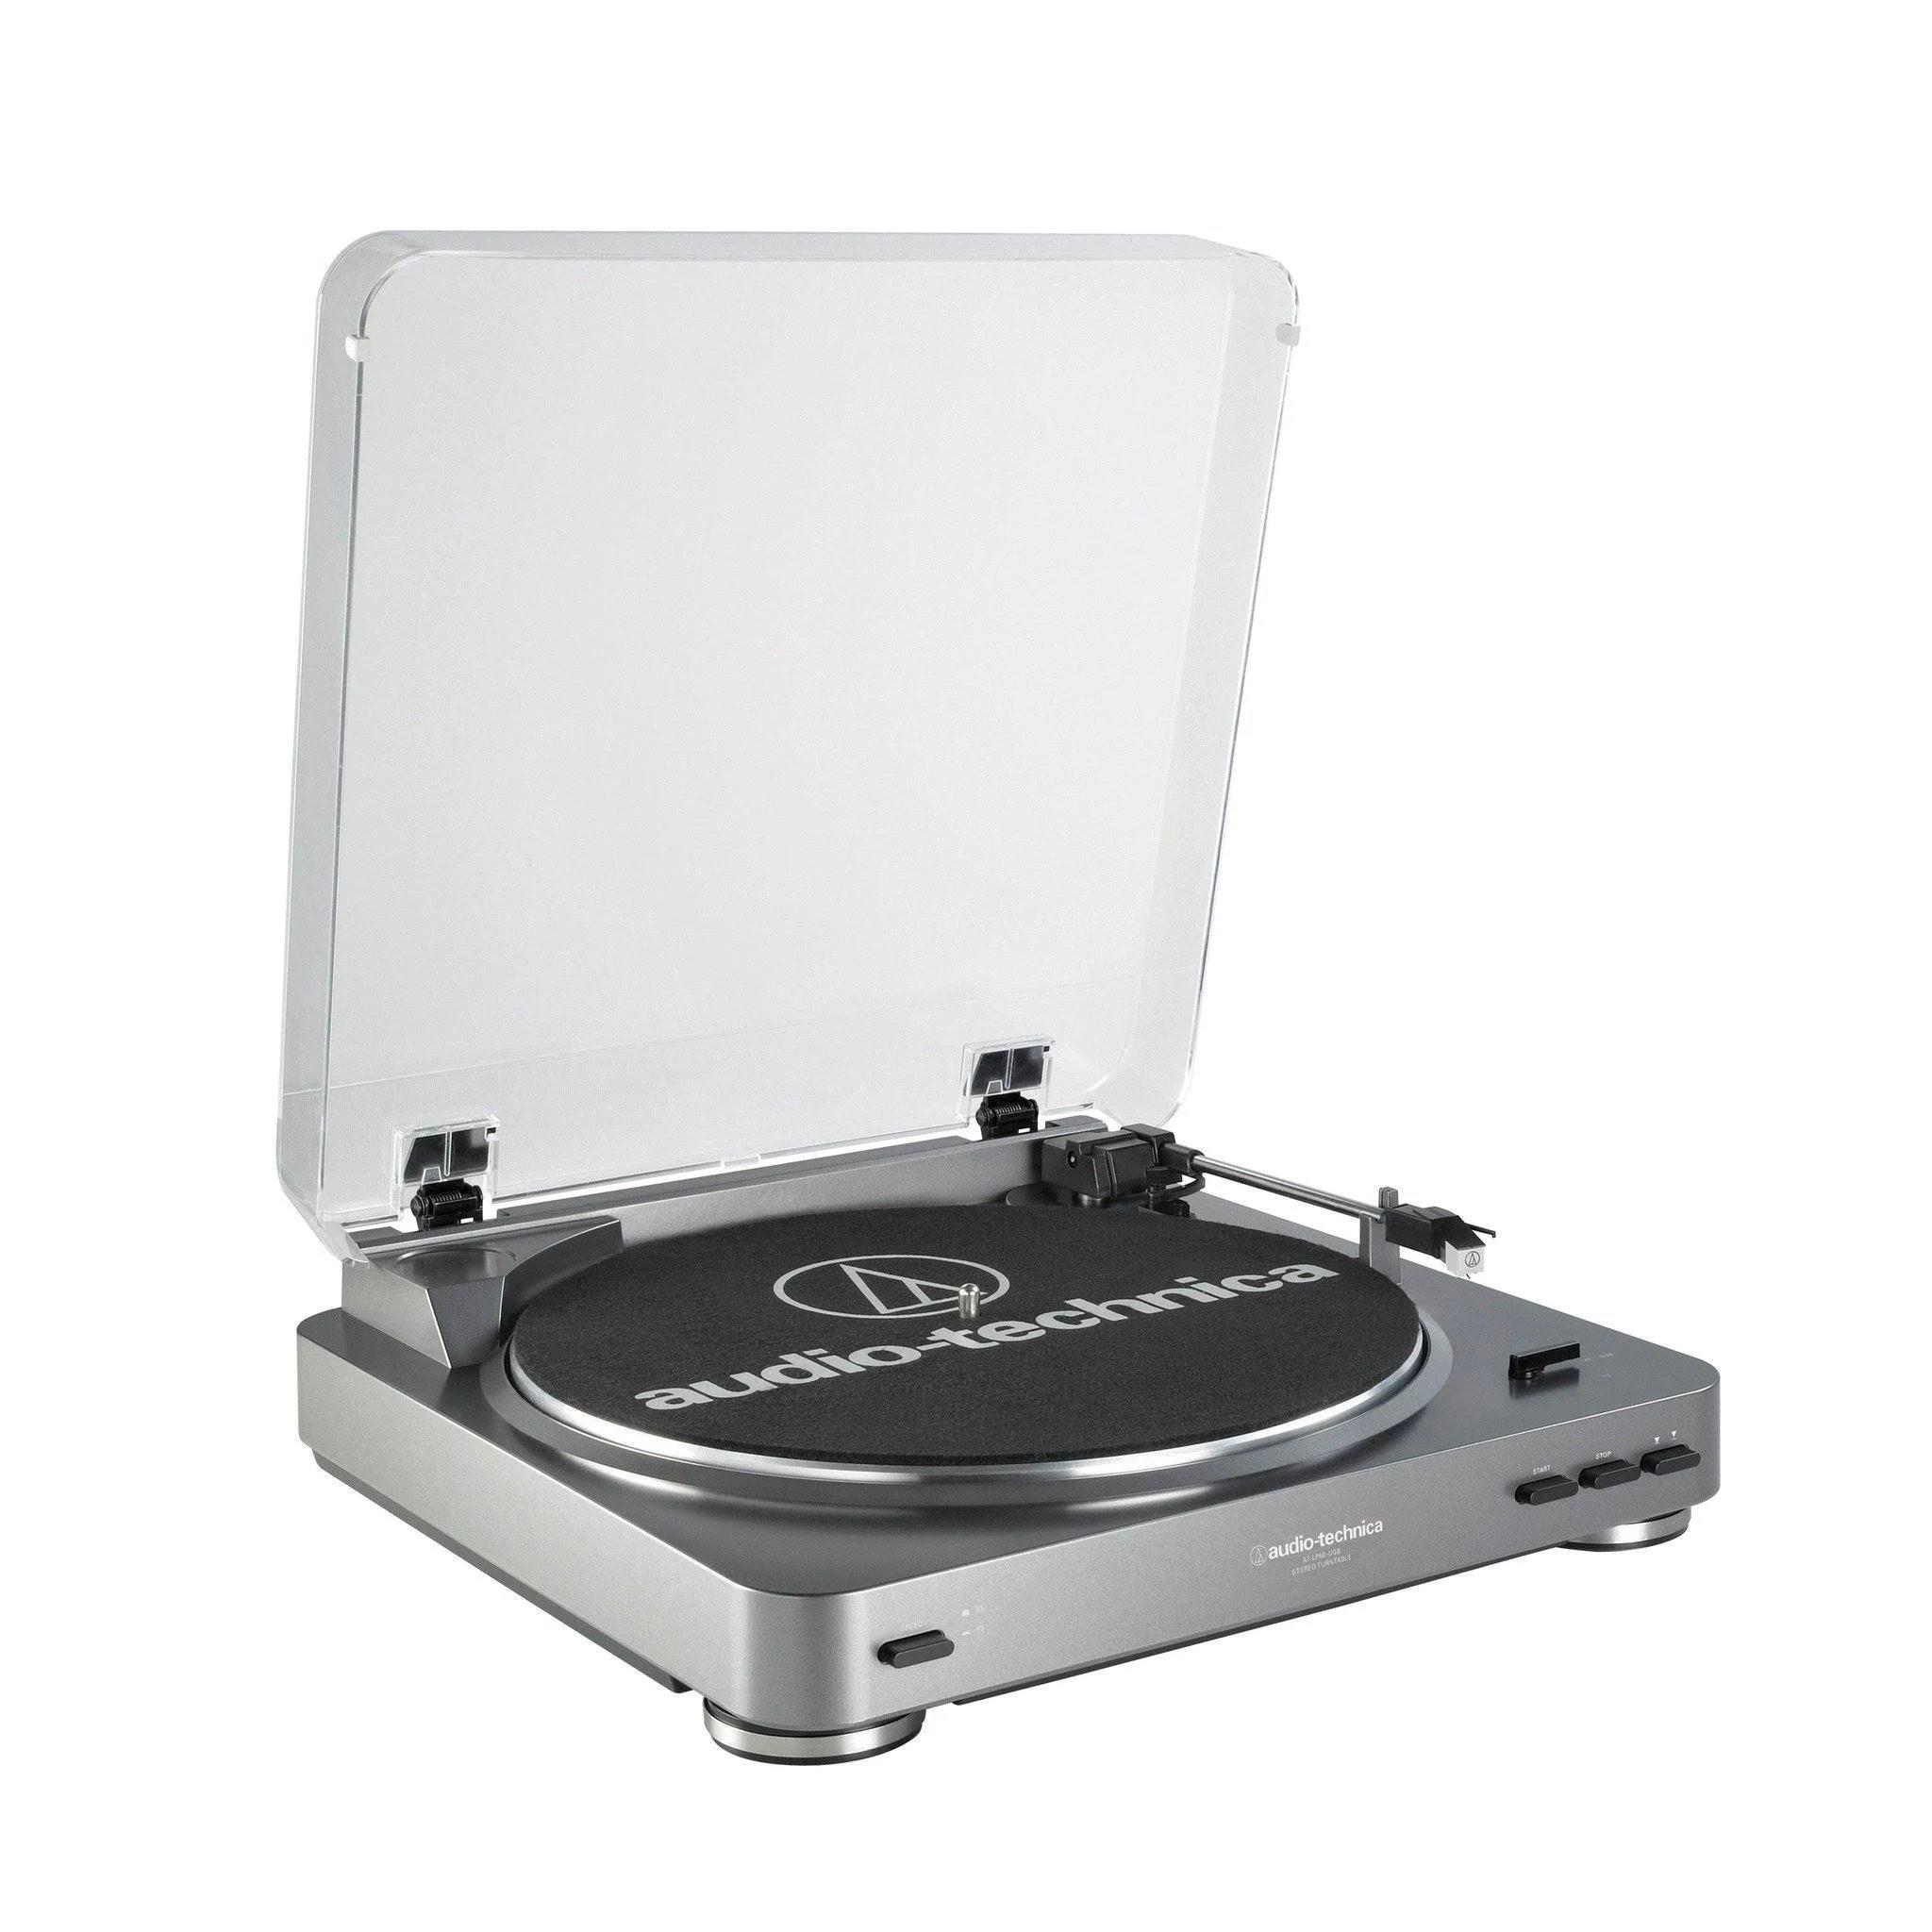 Audio Technica Lp60 Turntable